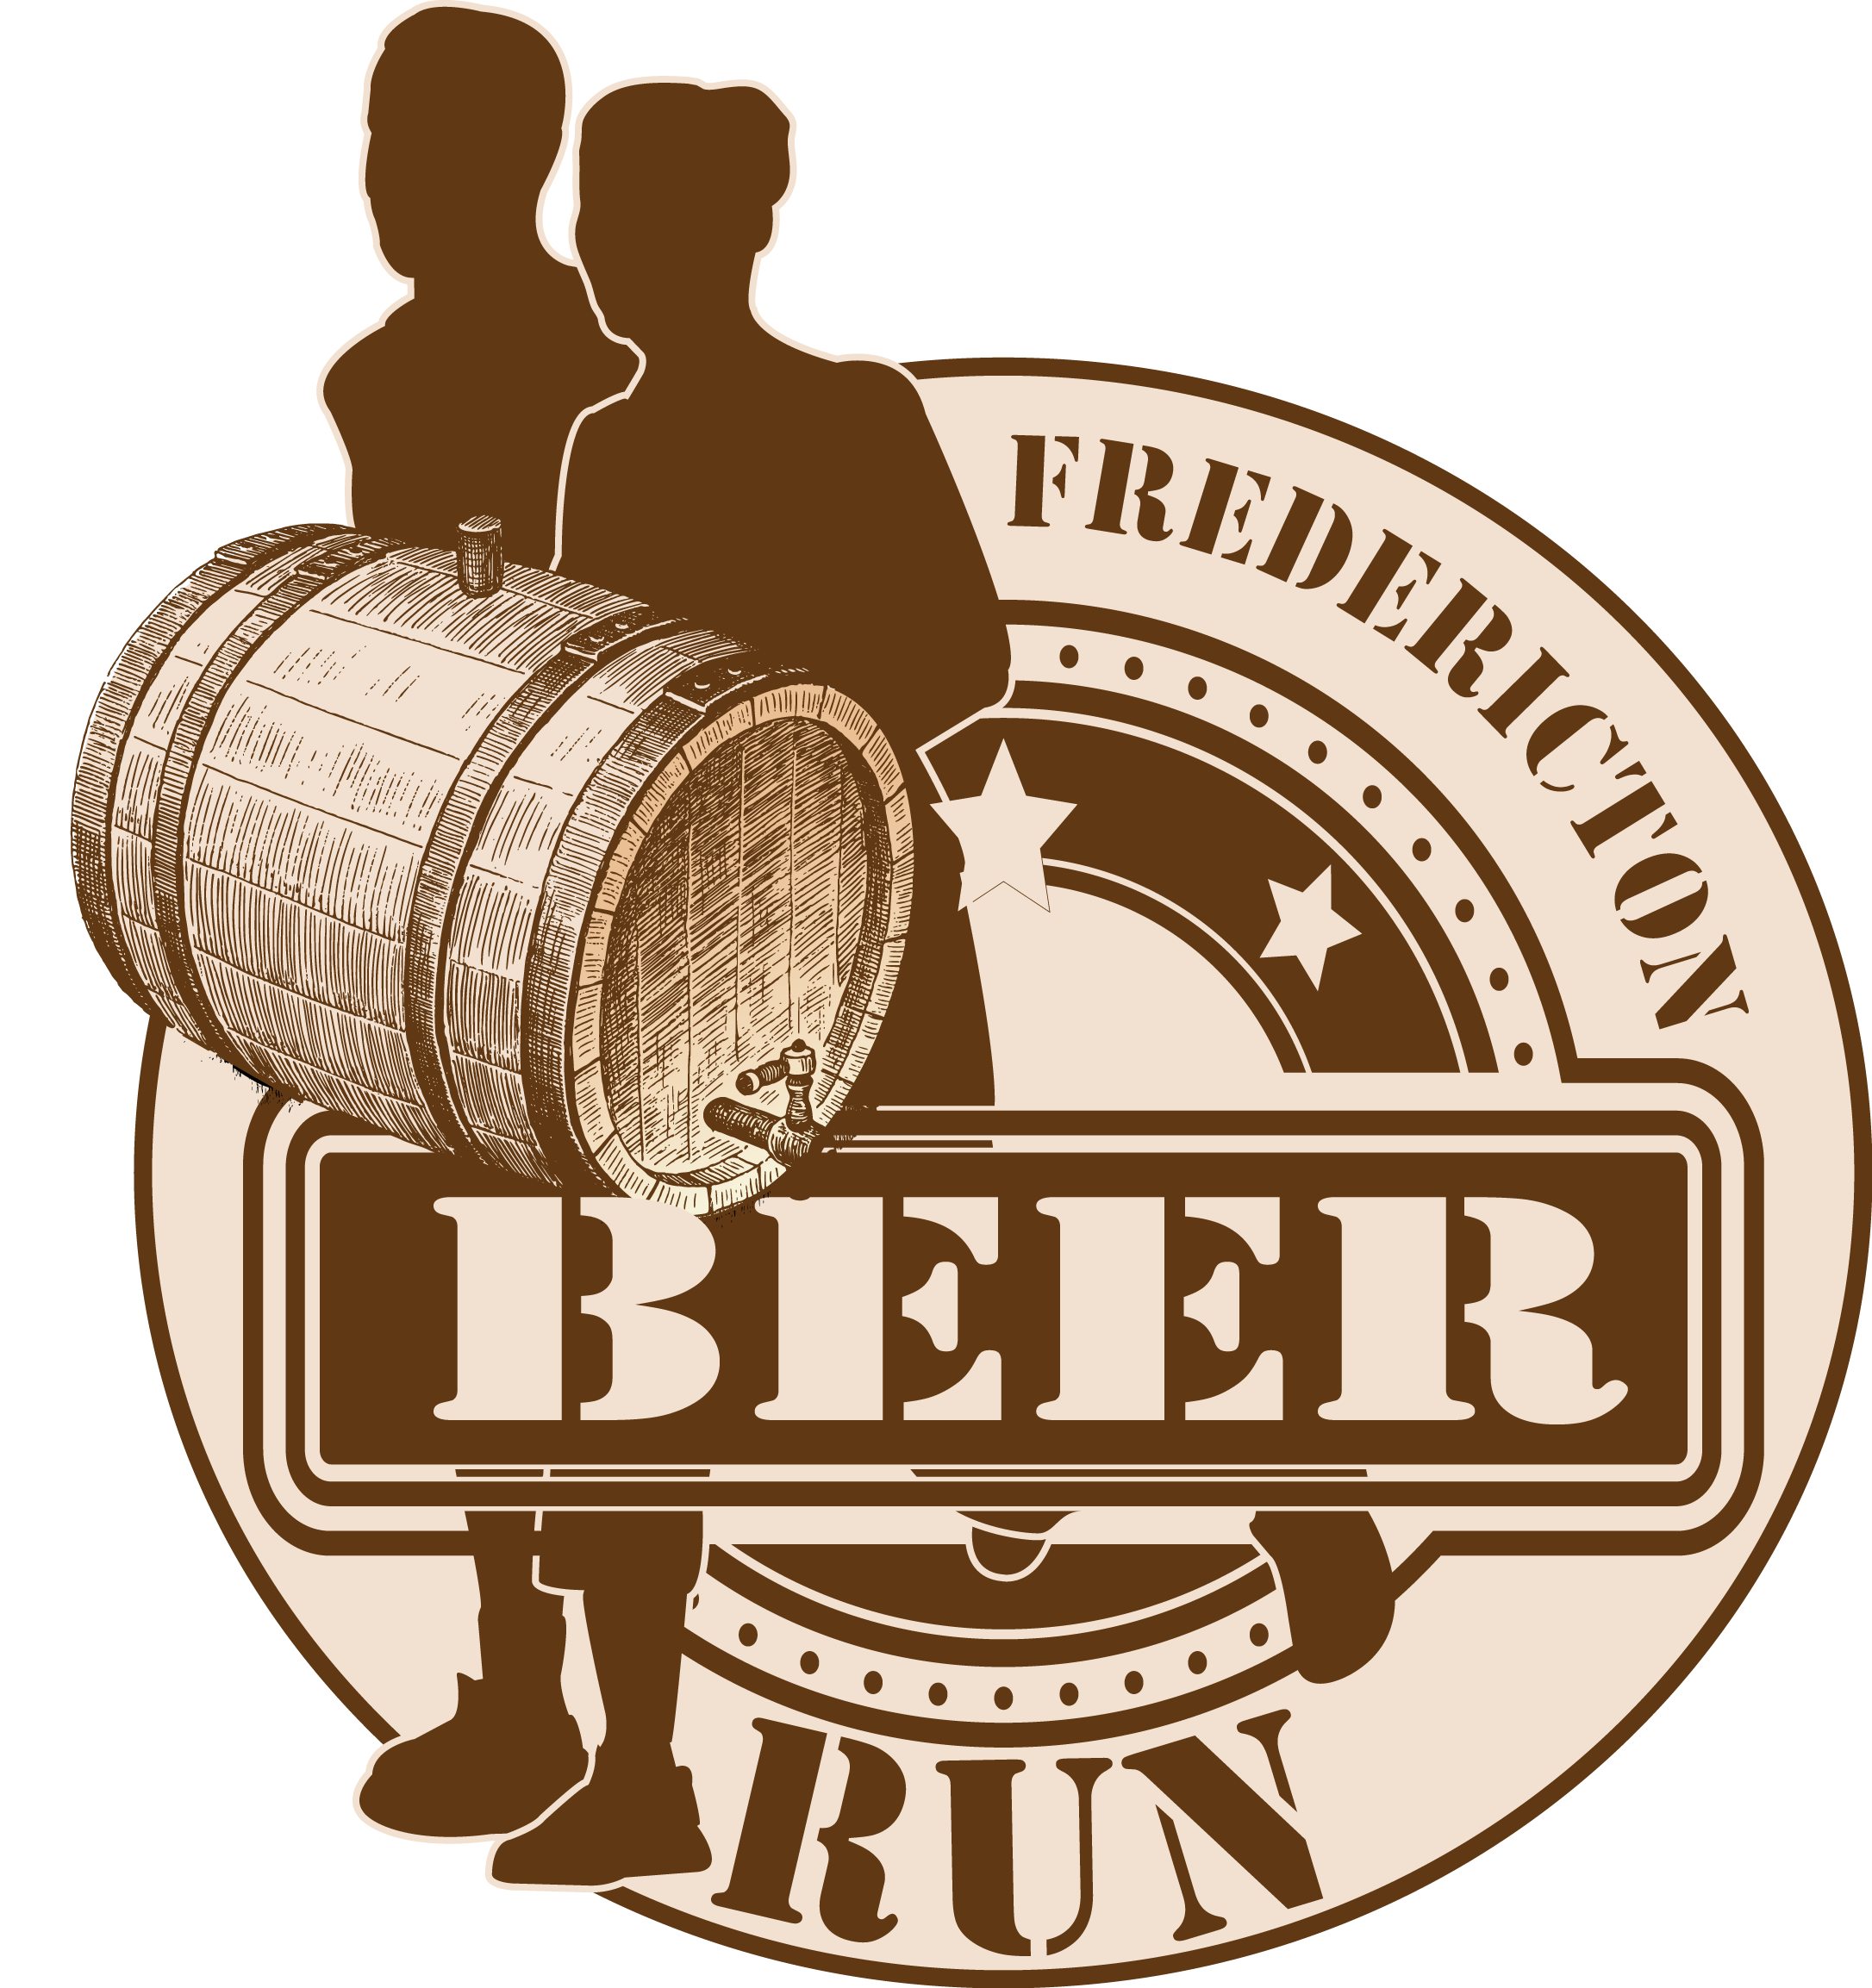 Fredericton Beer Run 2020